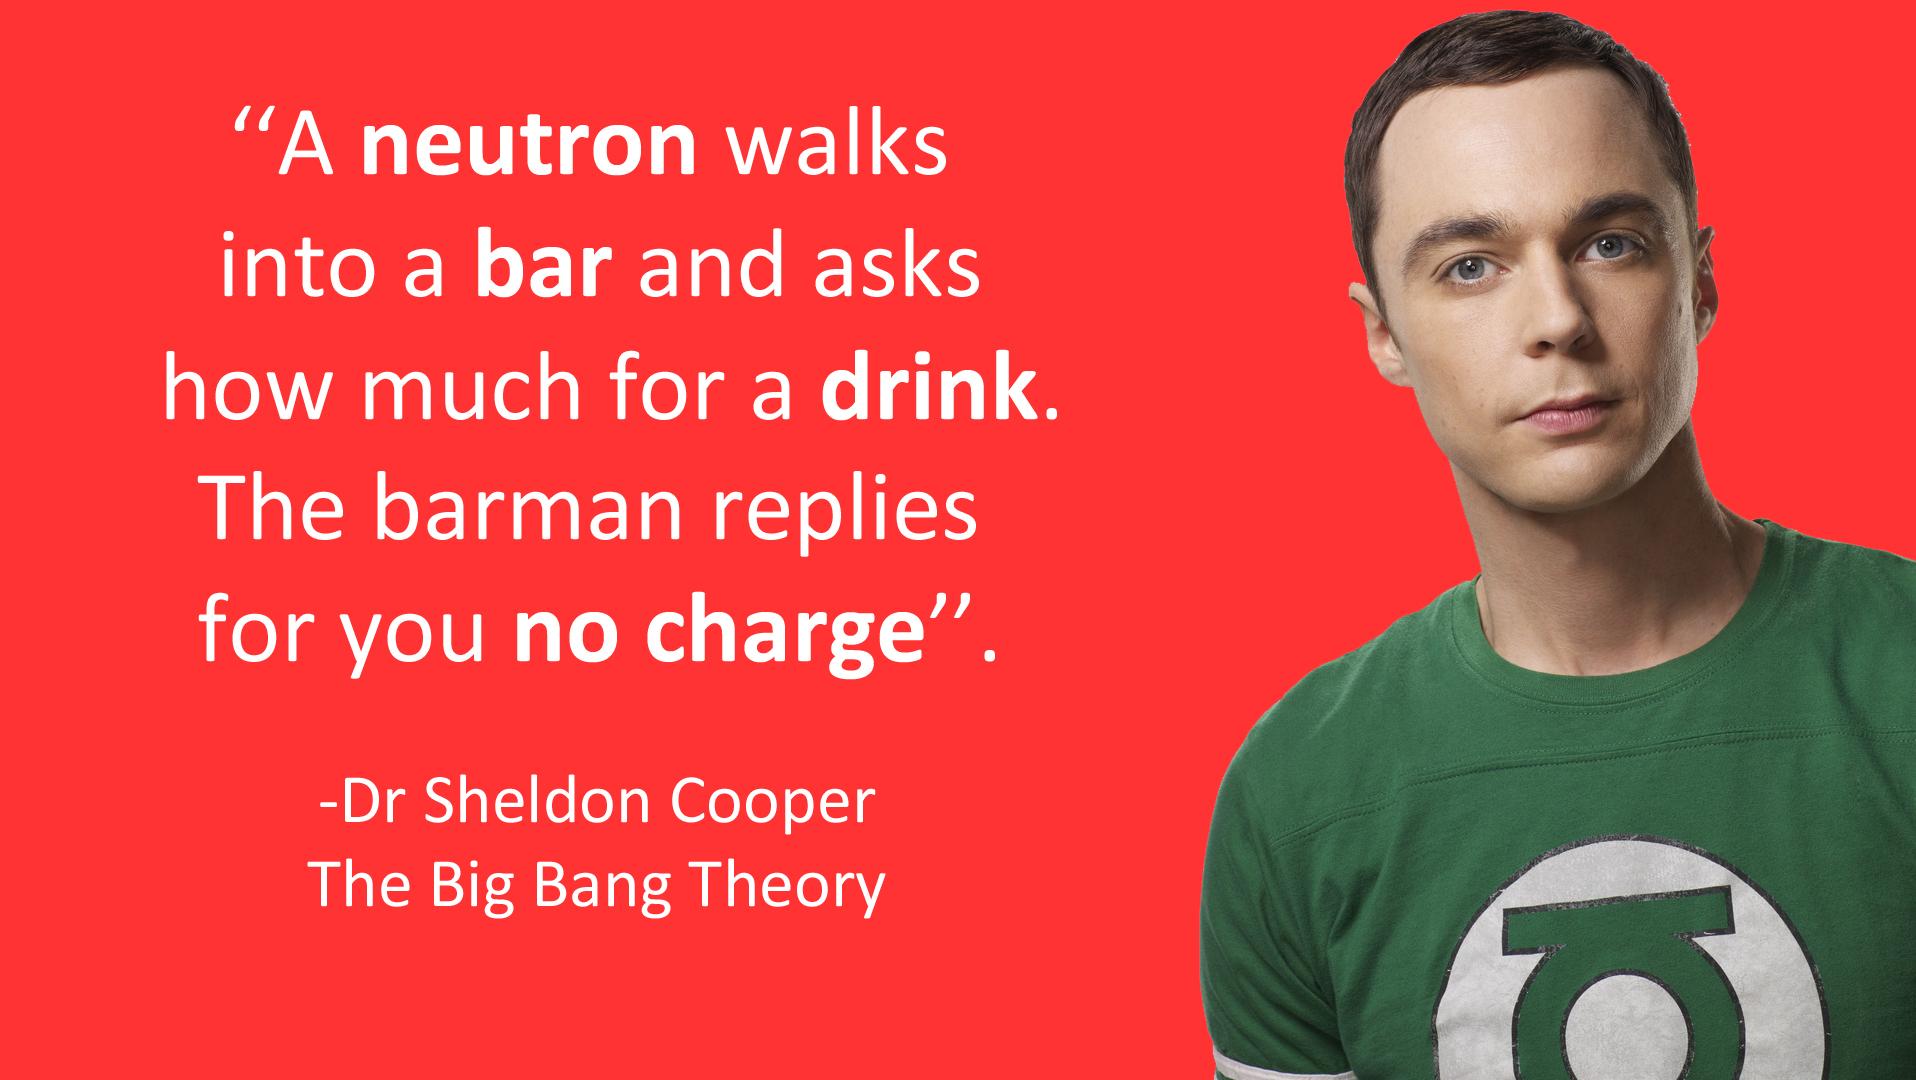 Sheldon Cooper neutron Joke (the big bang theory)